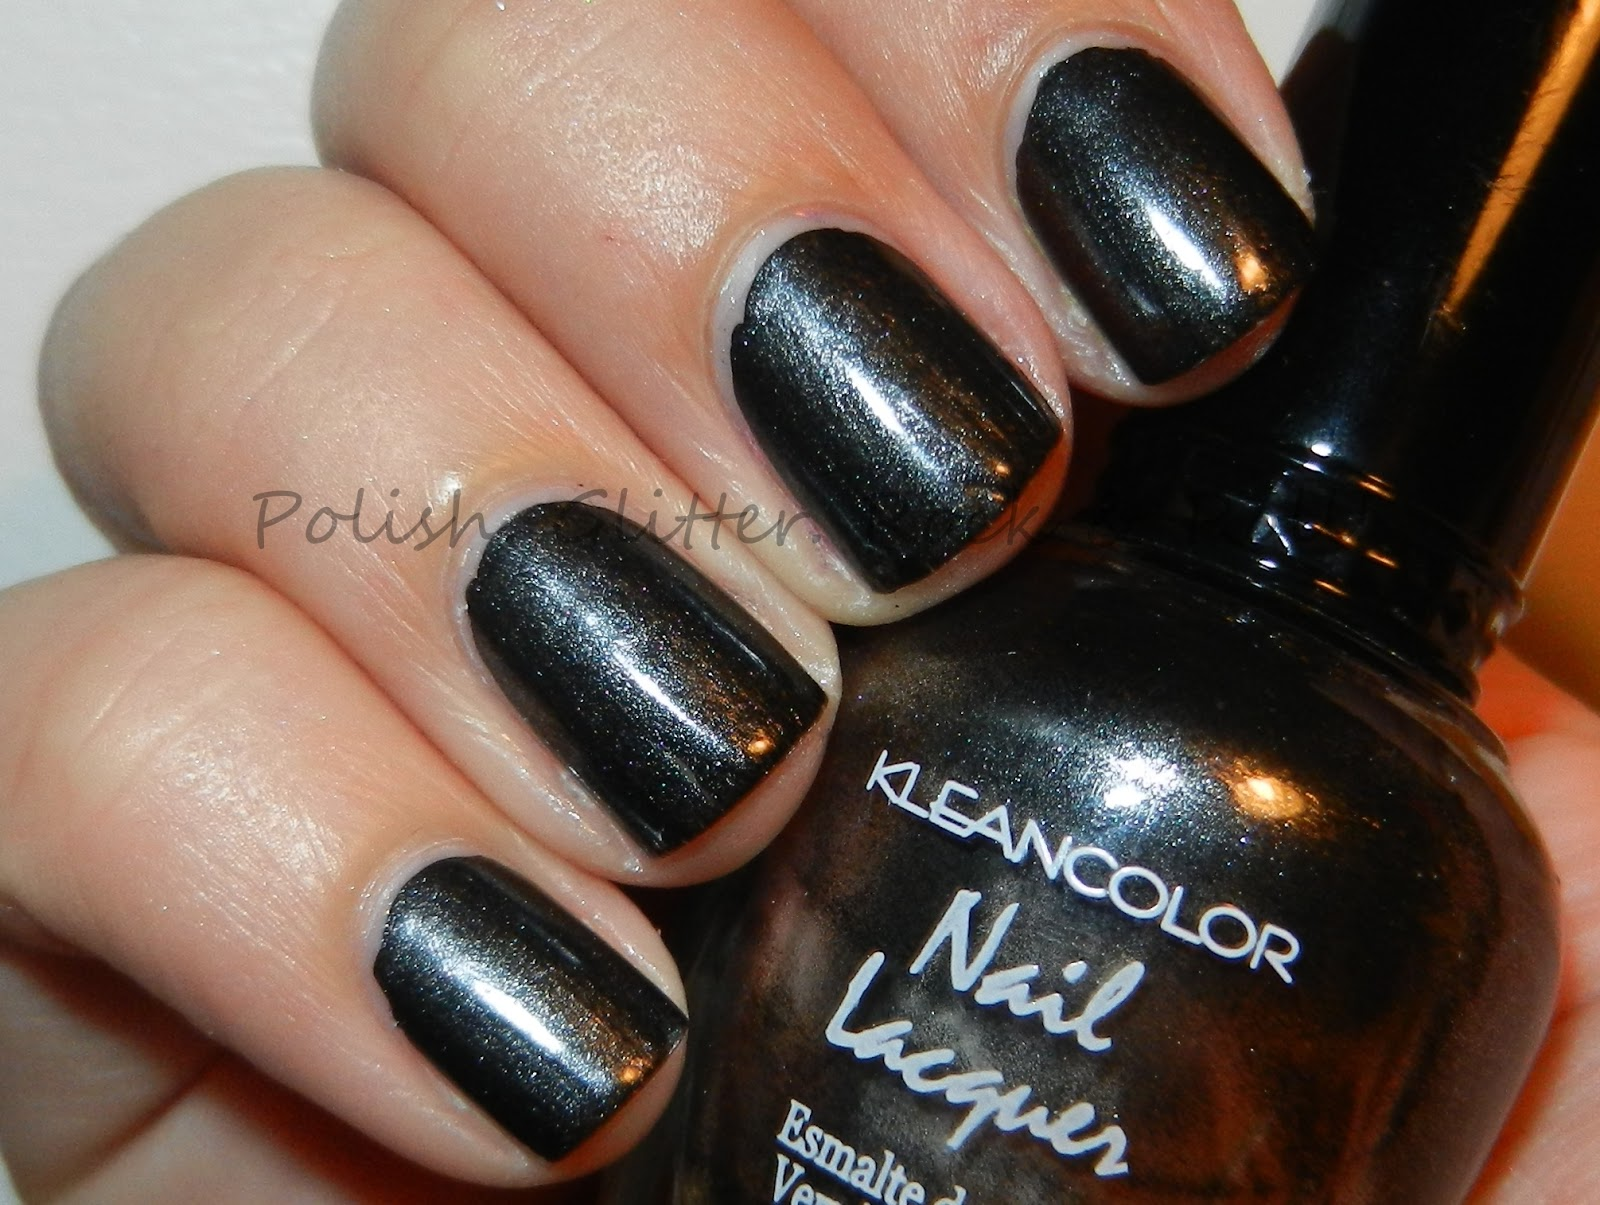 Polish. Glitter. Rock & Roll!: Kleancolor Metallic Black